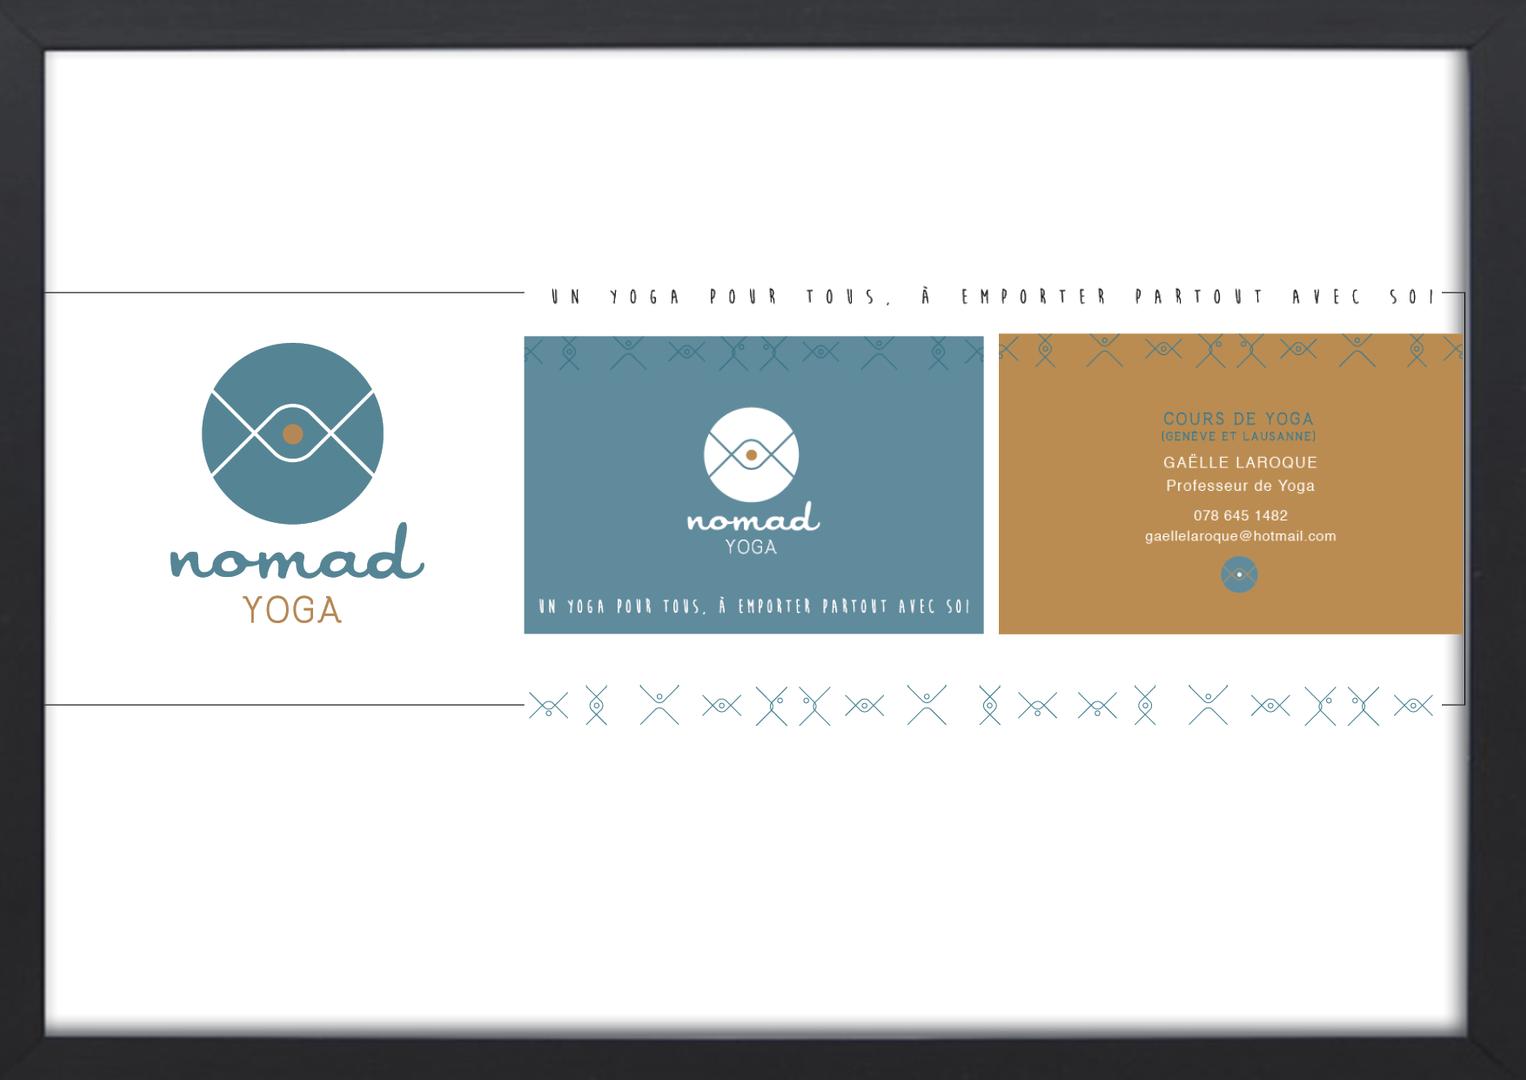 projets logo13.png